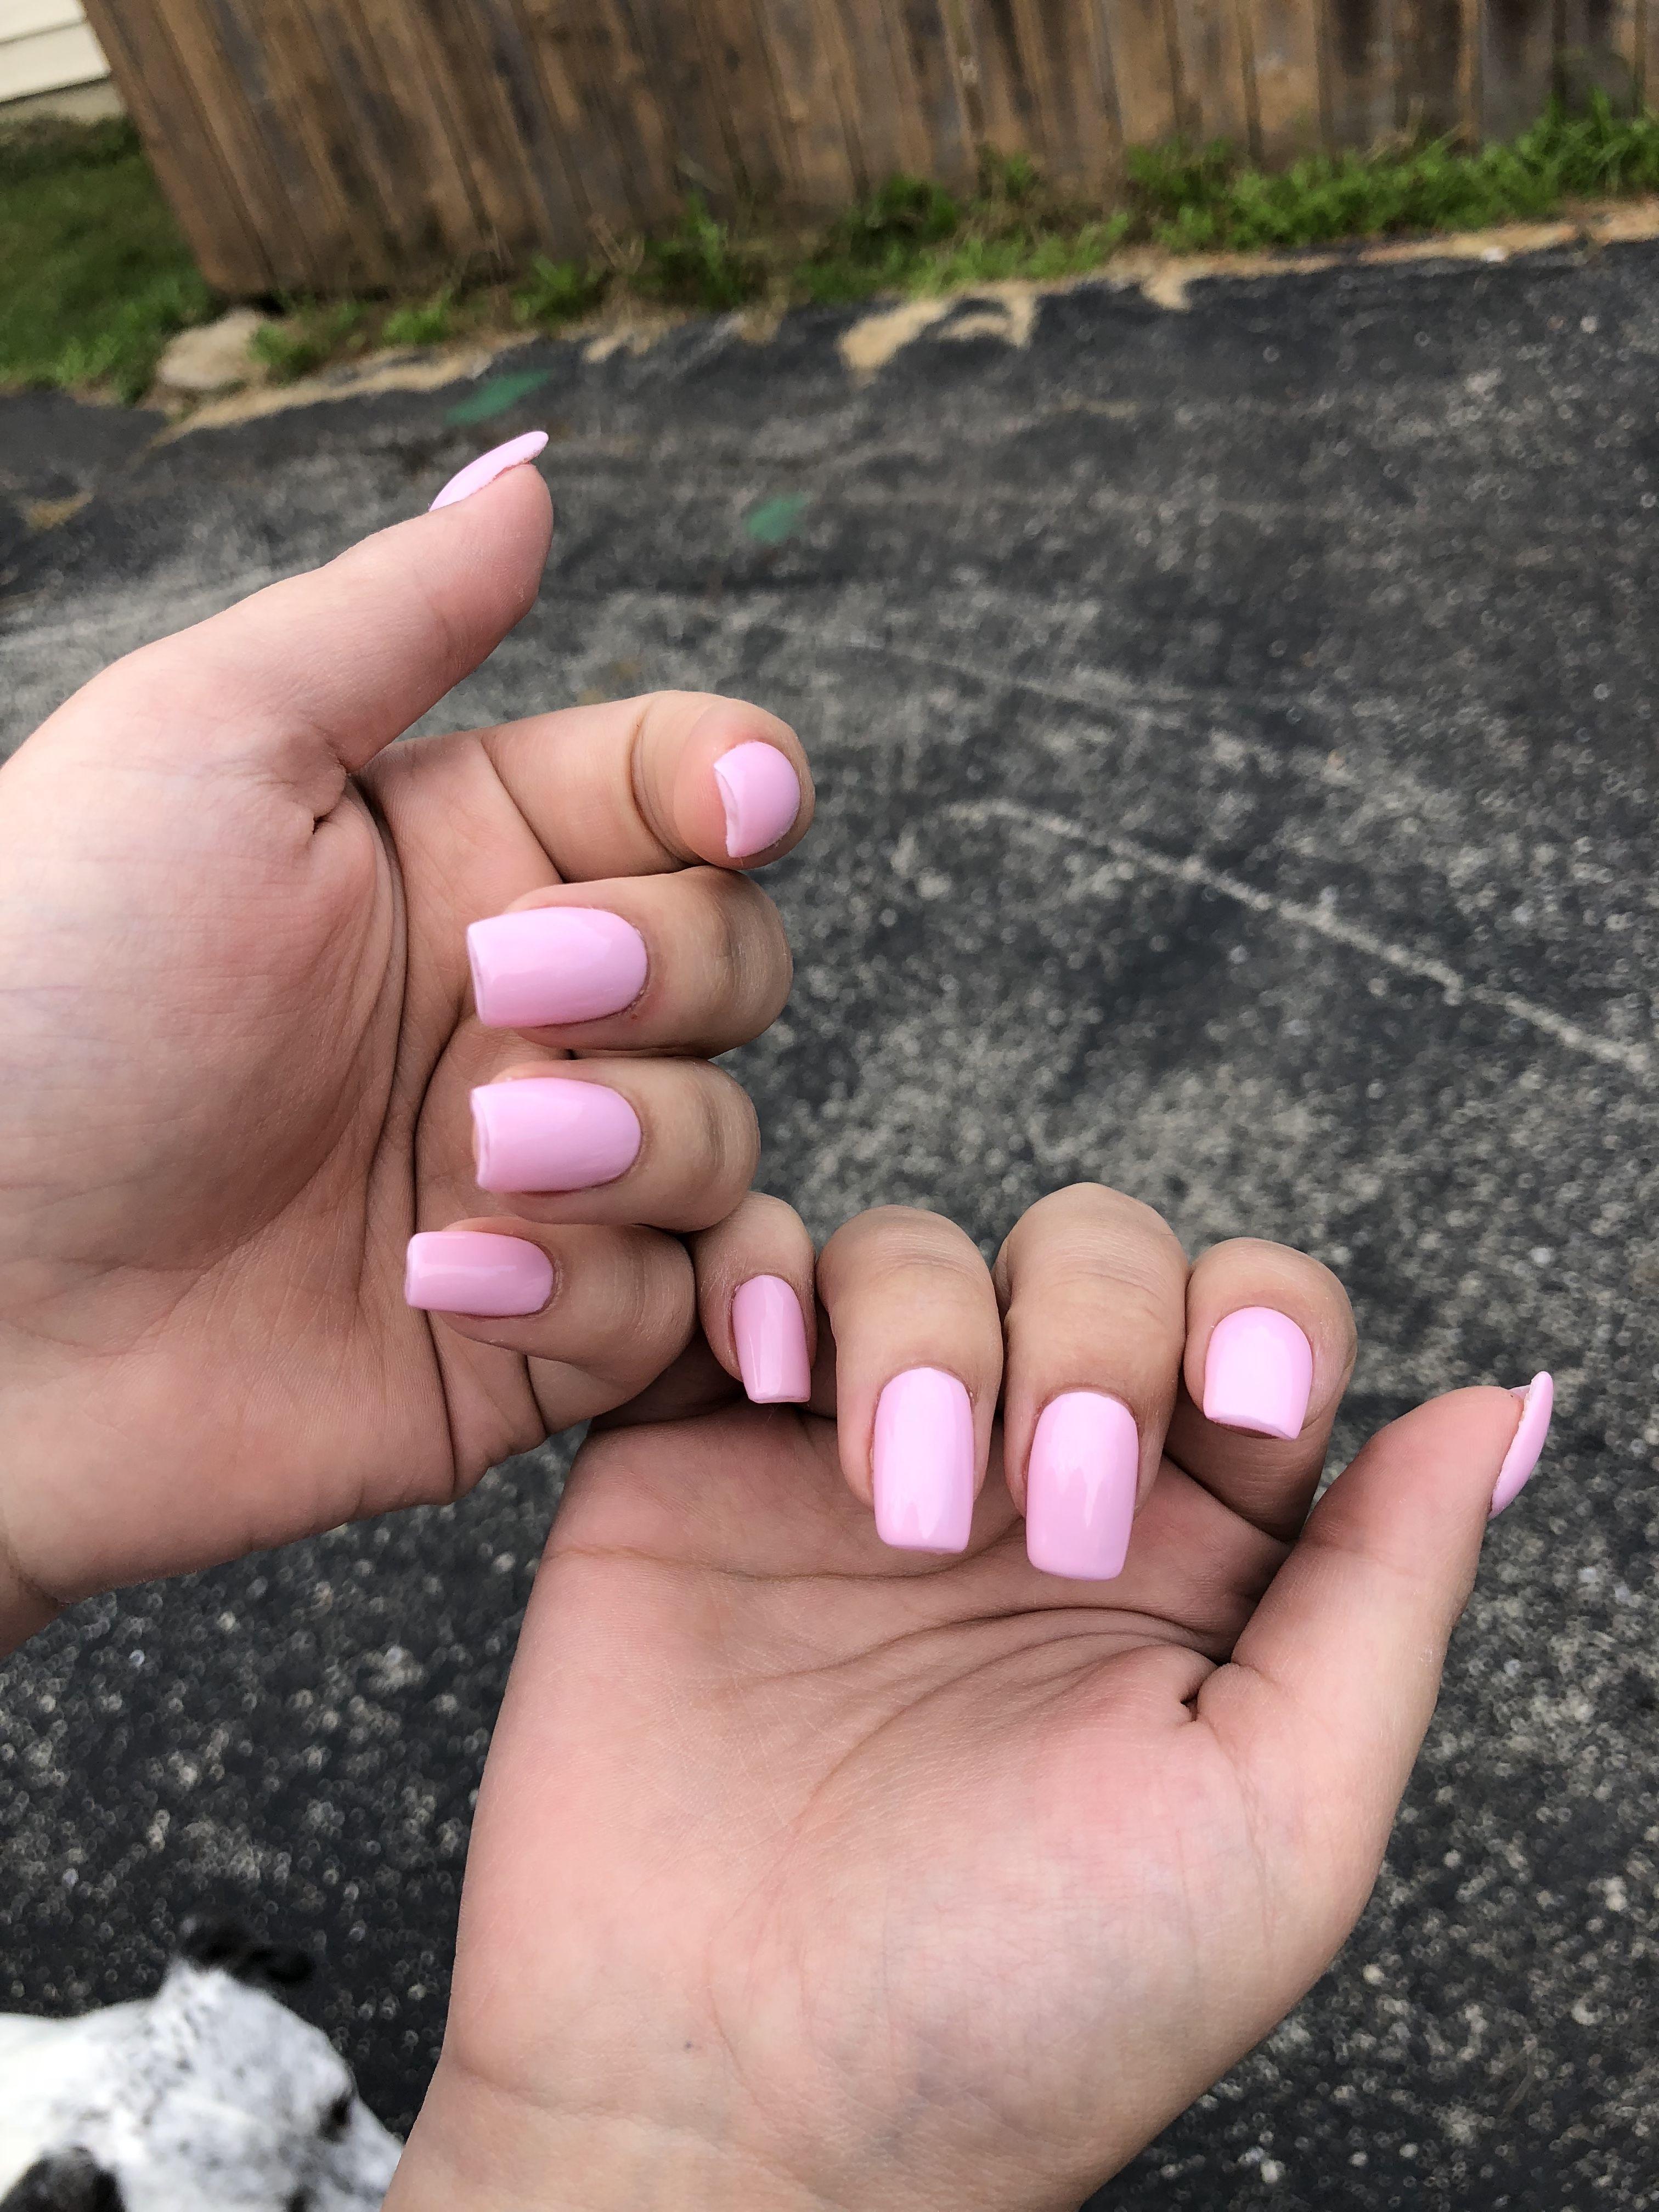 Pink Acrylic Nails Long Light Pink Bright Pink Square Nails Pink Acrylic Nails Light Pink Acrylic Nails Bright Acrylic Nails